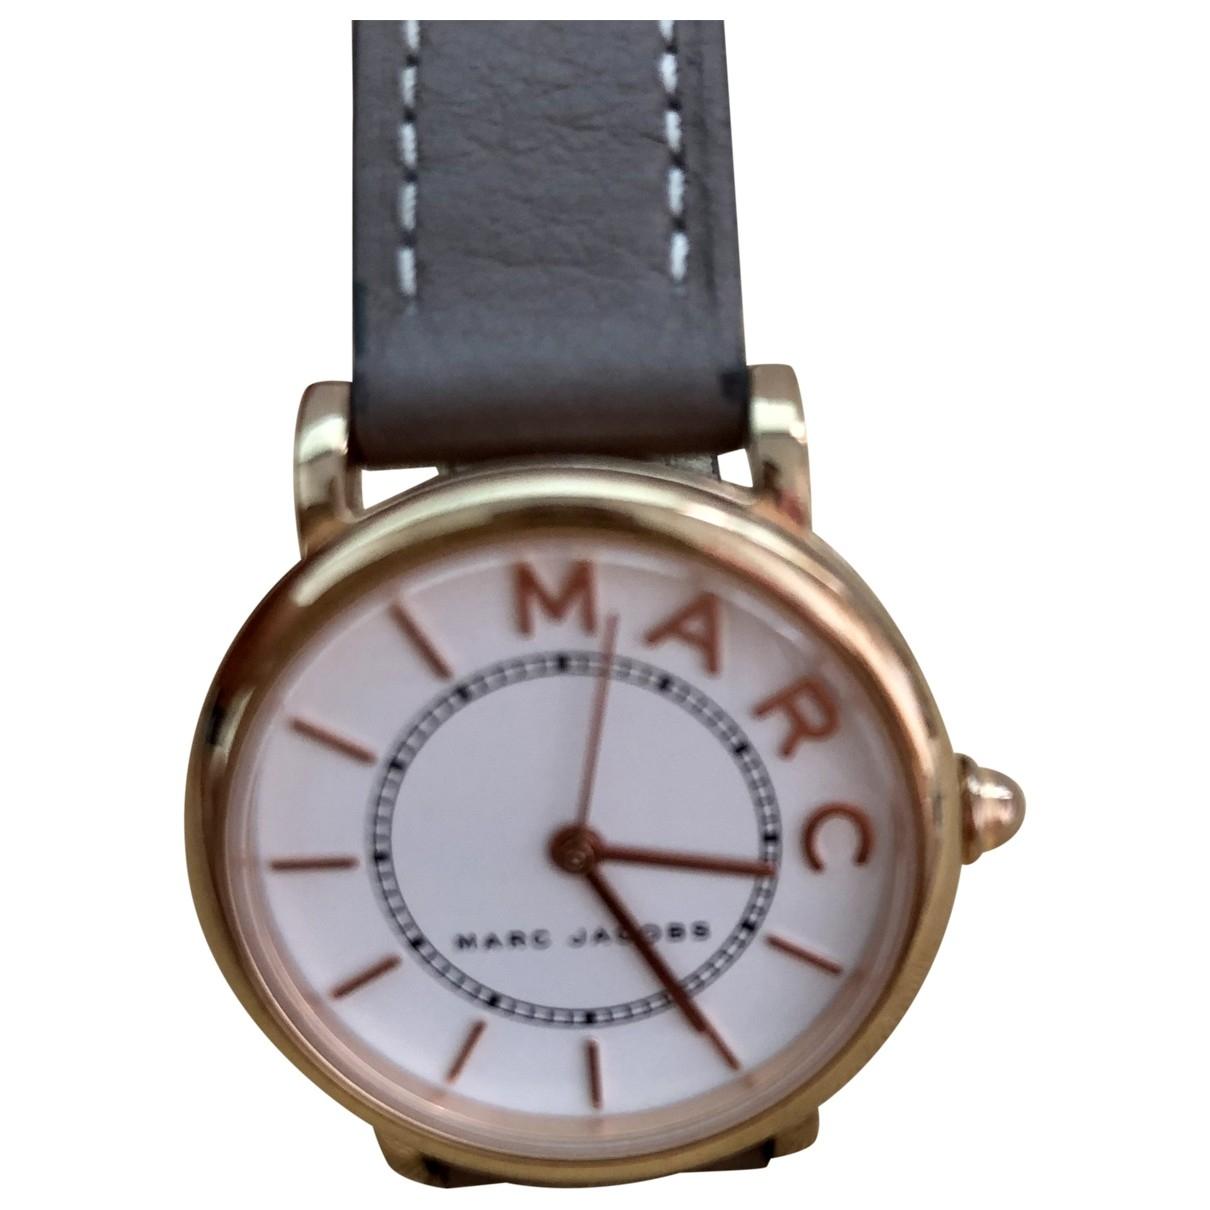 Marc Jacobs \N Uhr in  Braun Stahl